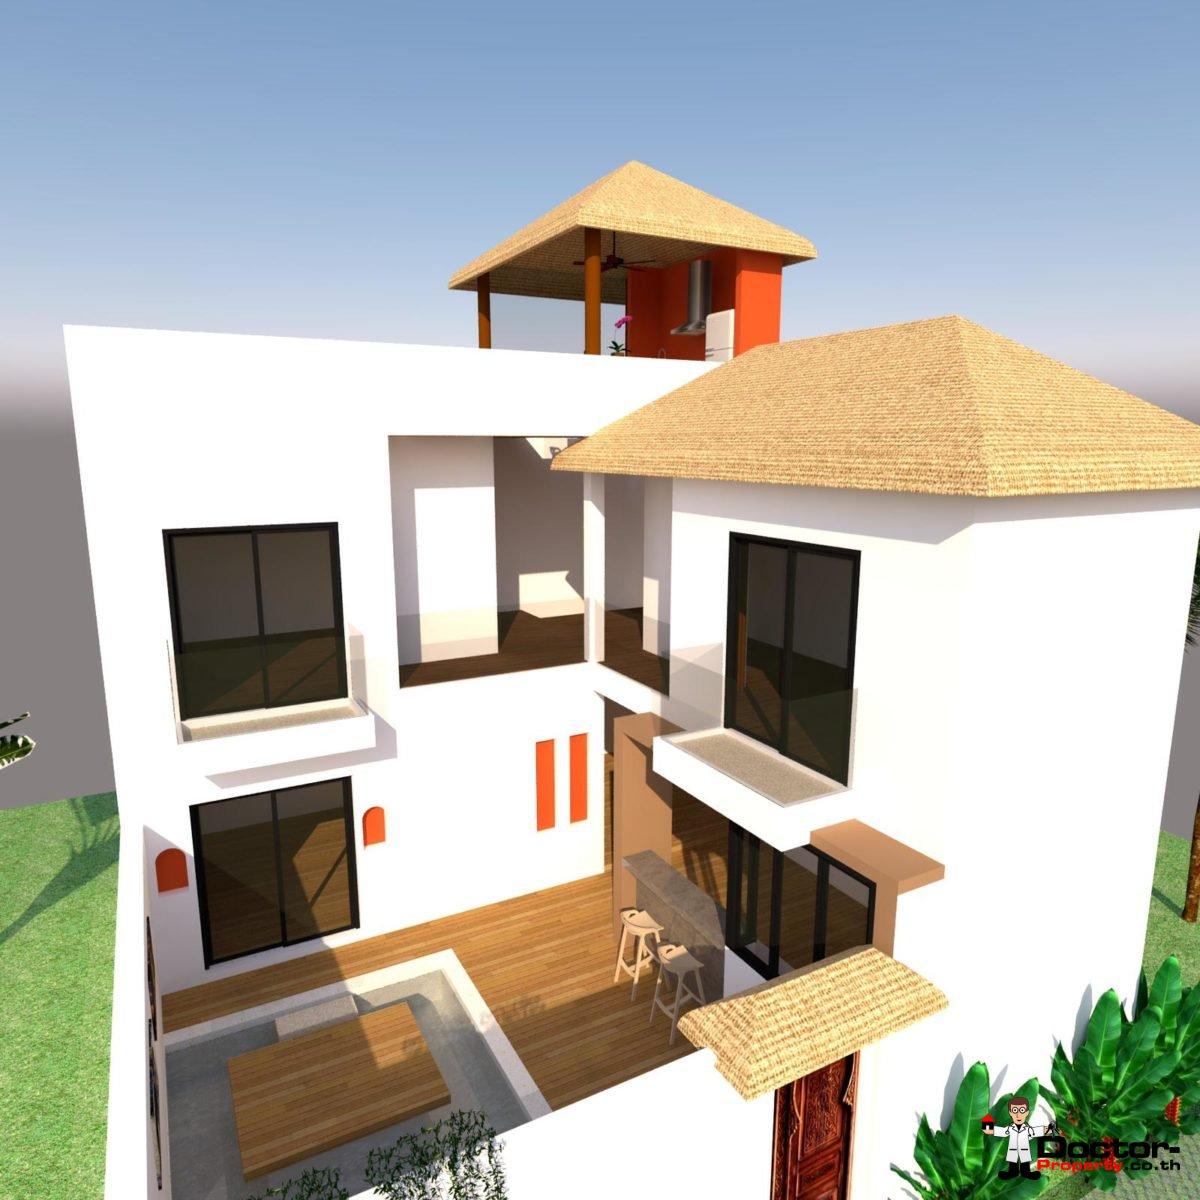 New 2 Bedroom Villa with Sea View - Lamai Beach - Koh Samui 3